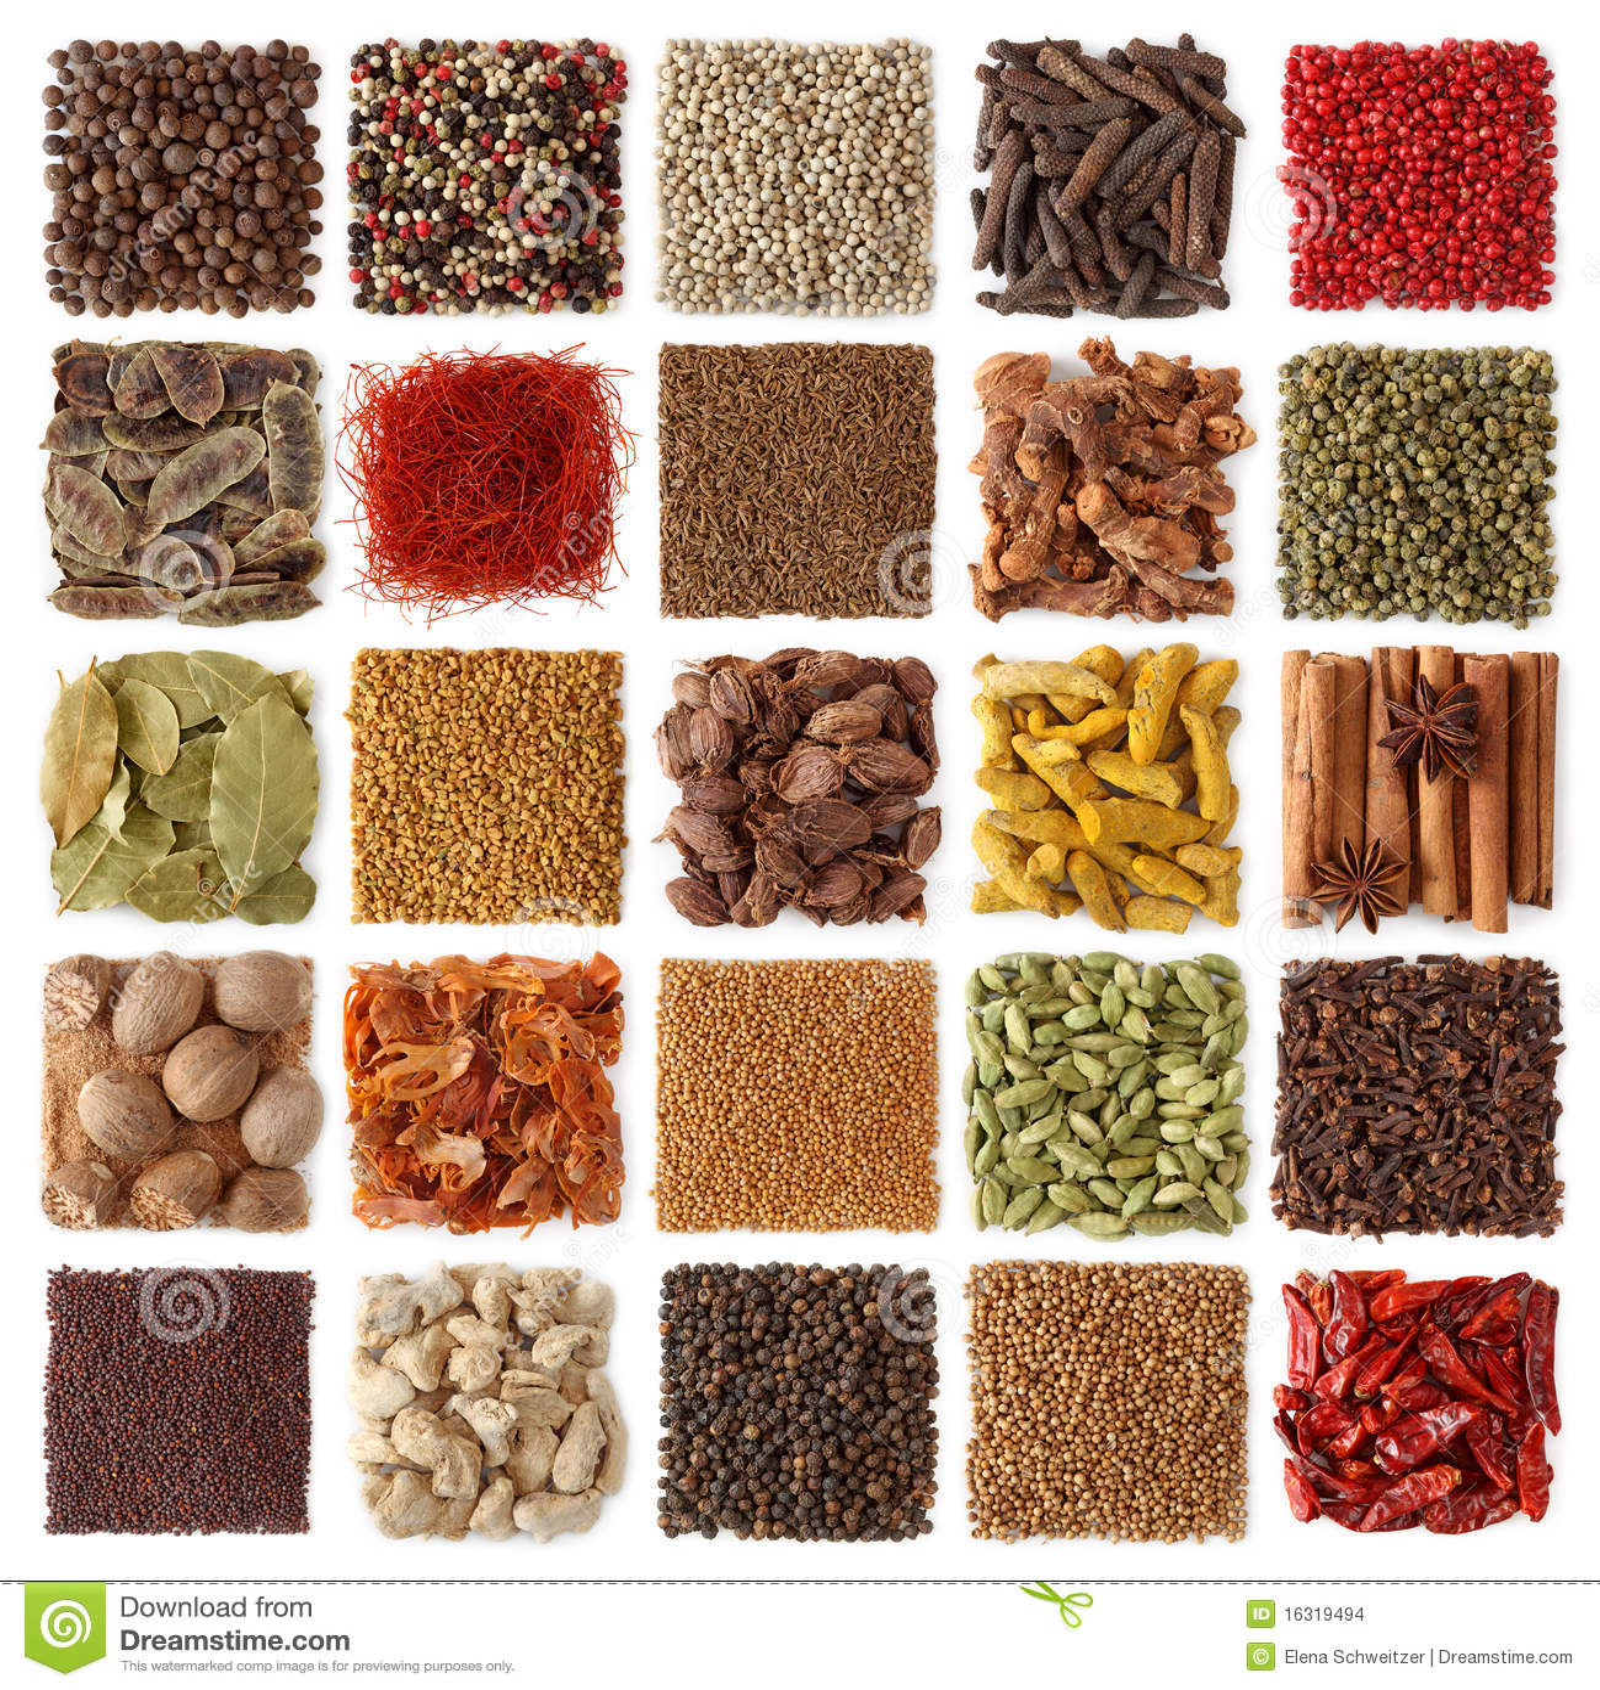 List Of Staple Foods In India